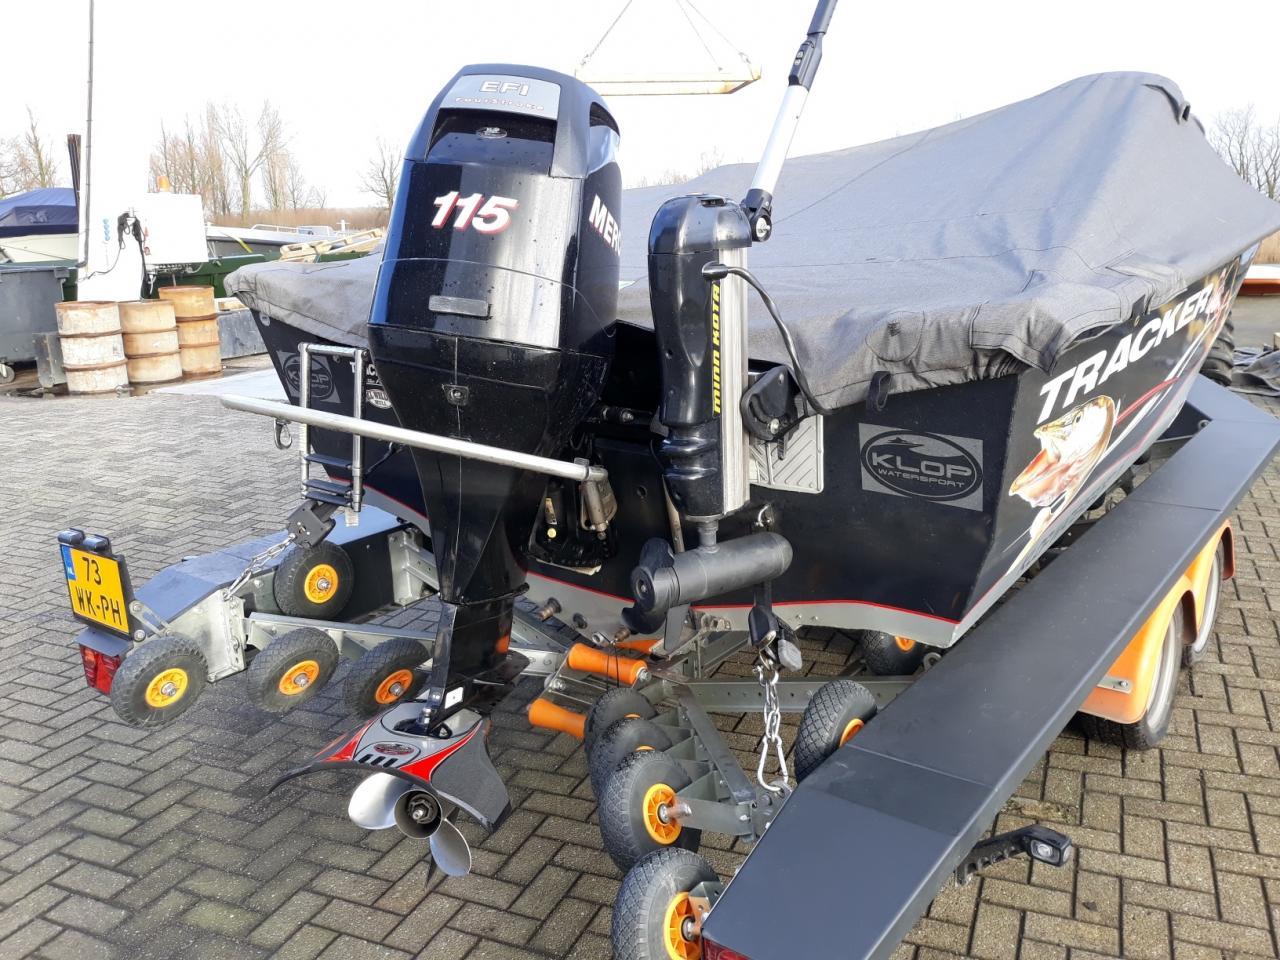 Tracker V175SC met Mercury F115 elpt 22